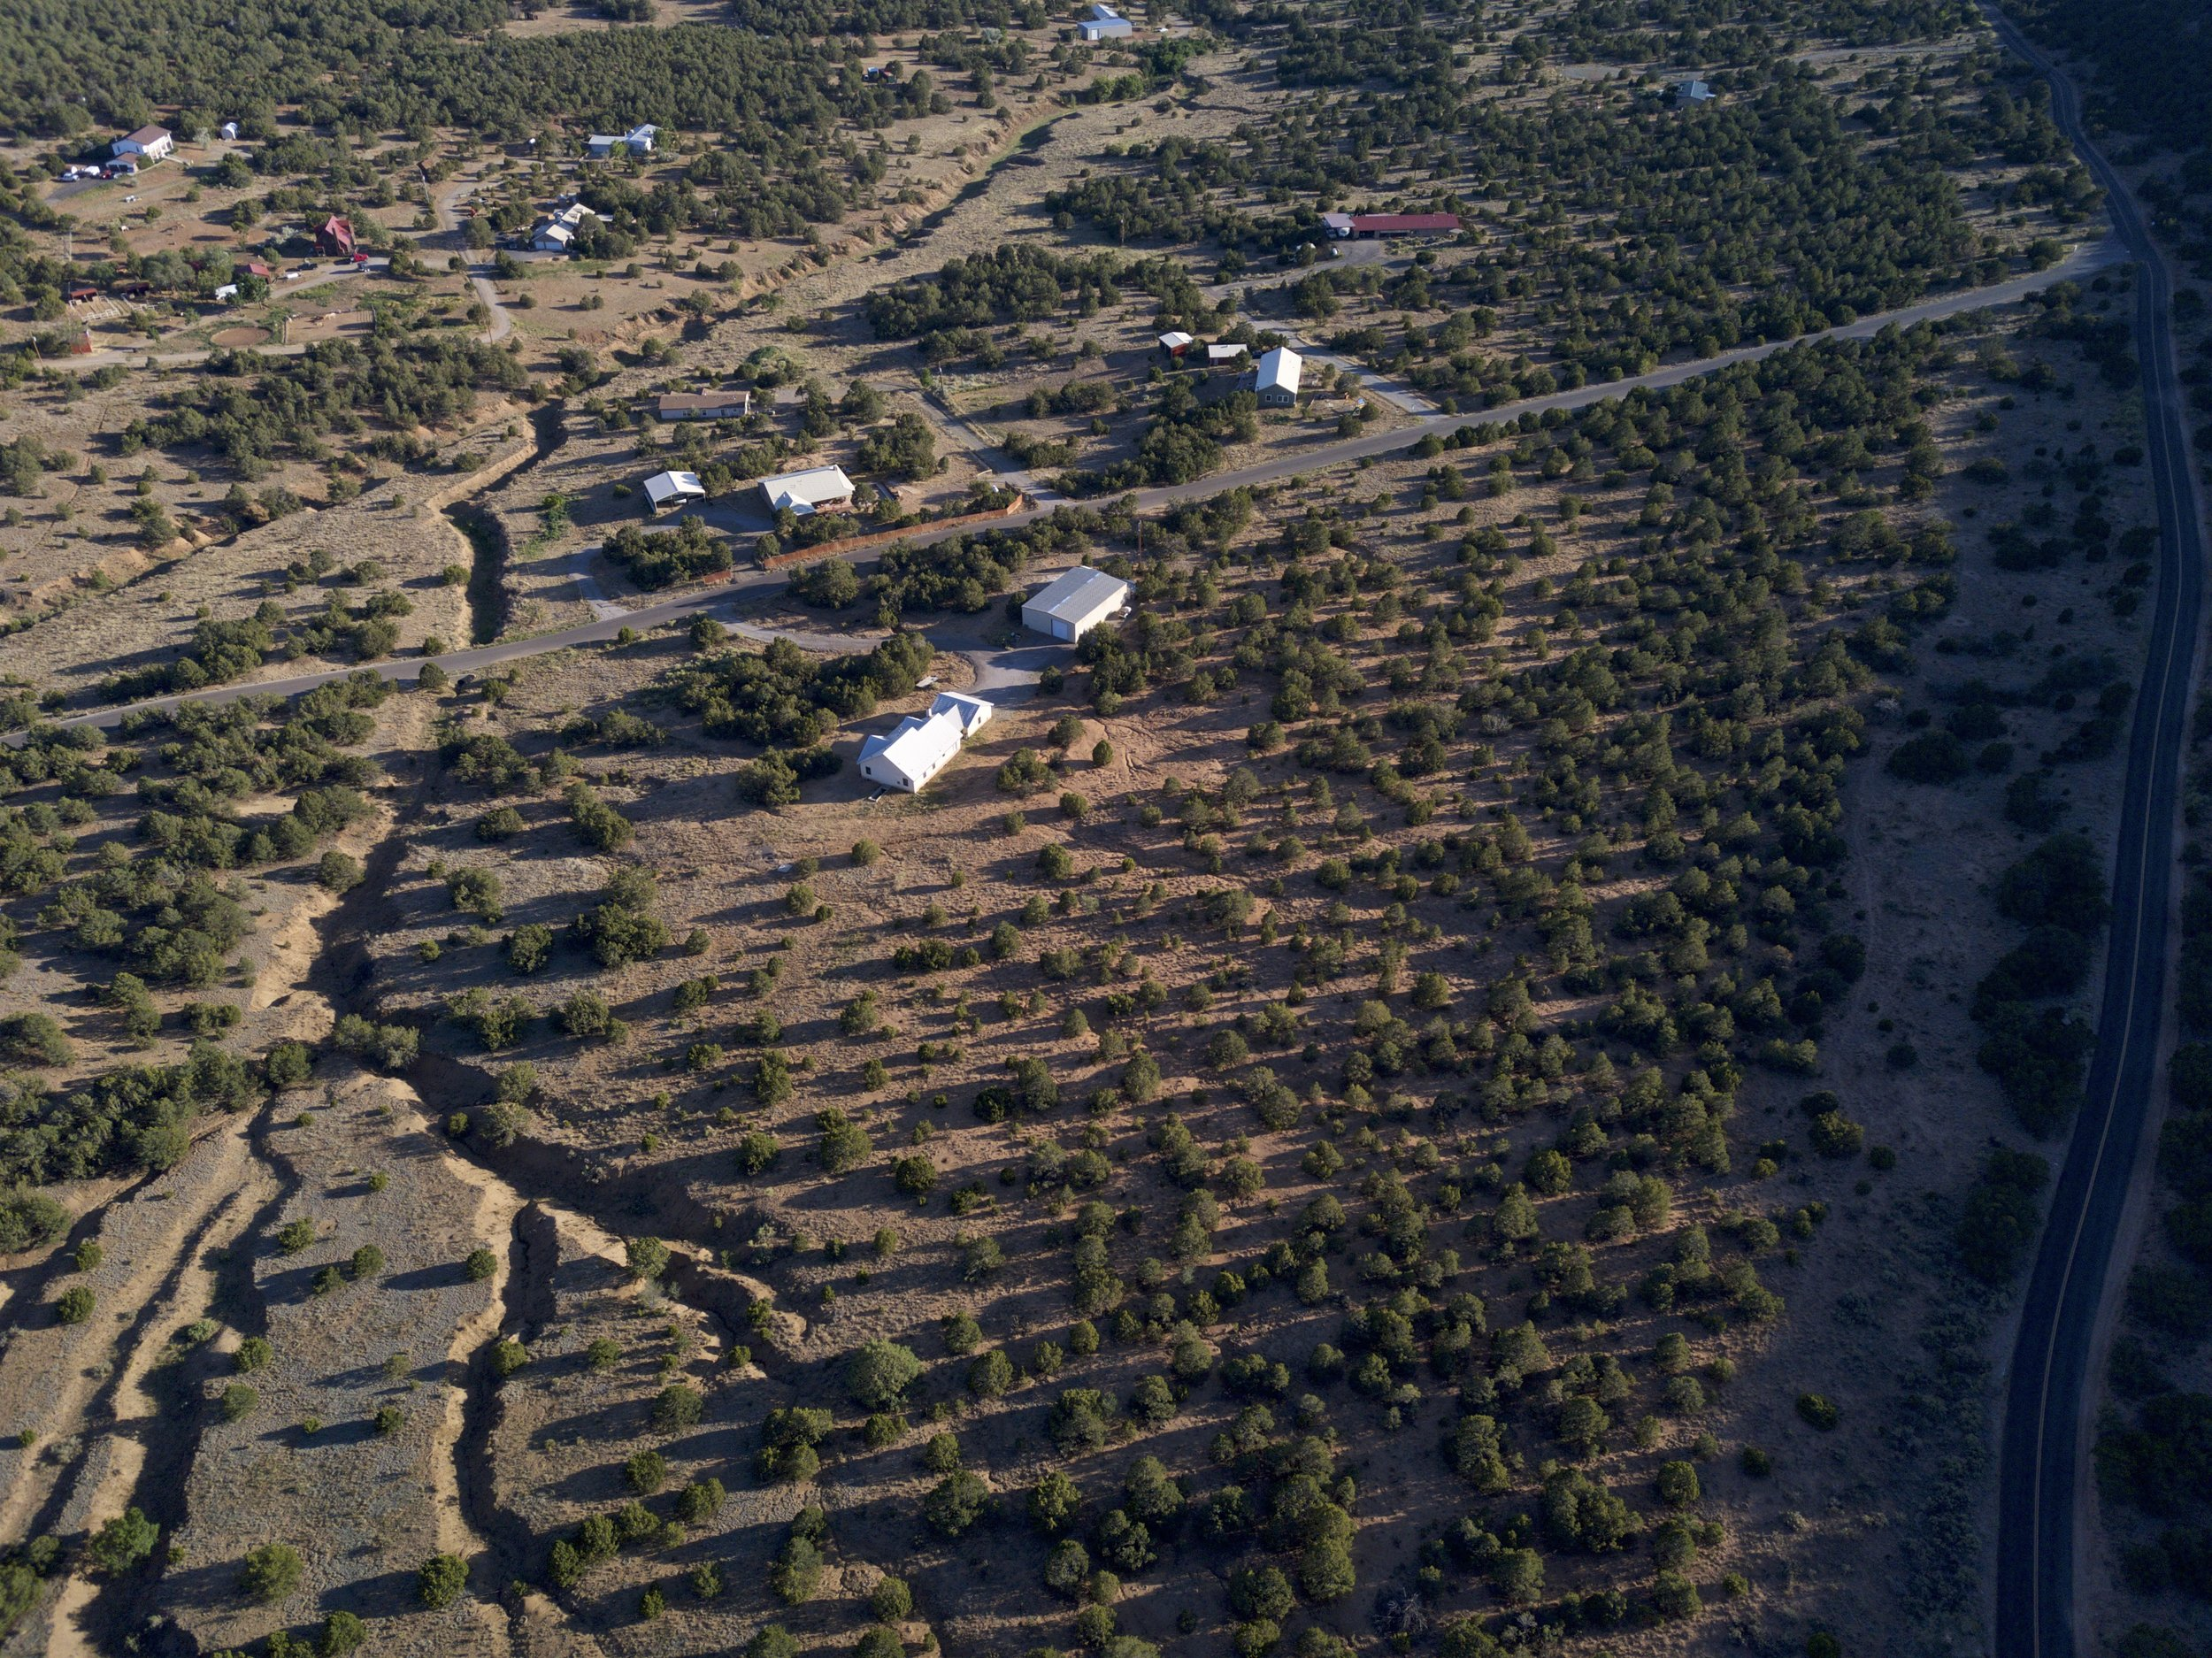 BRNM-3965-drone-96380.jpg